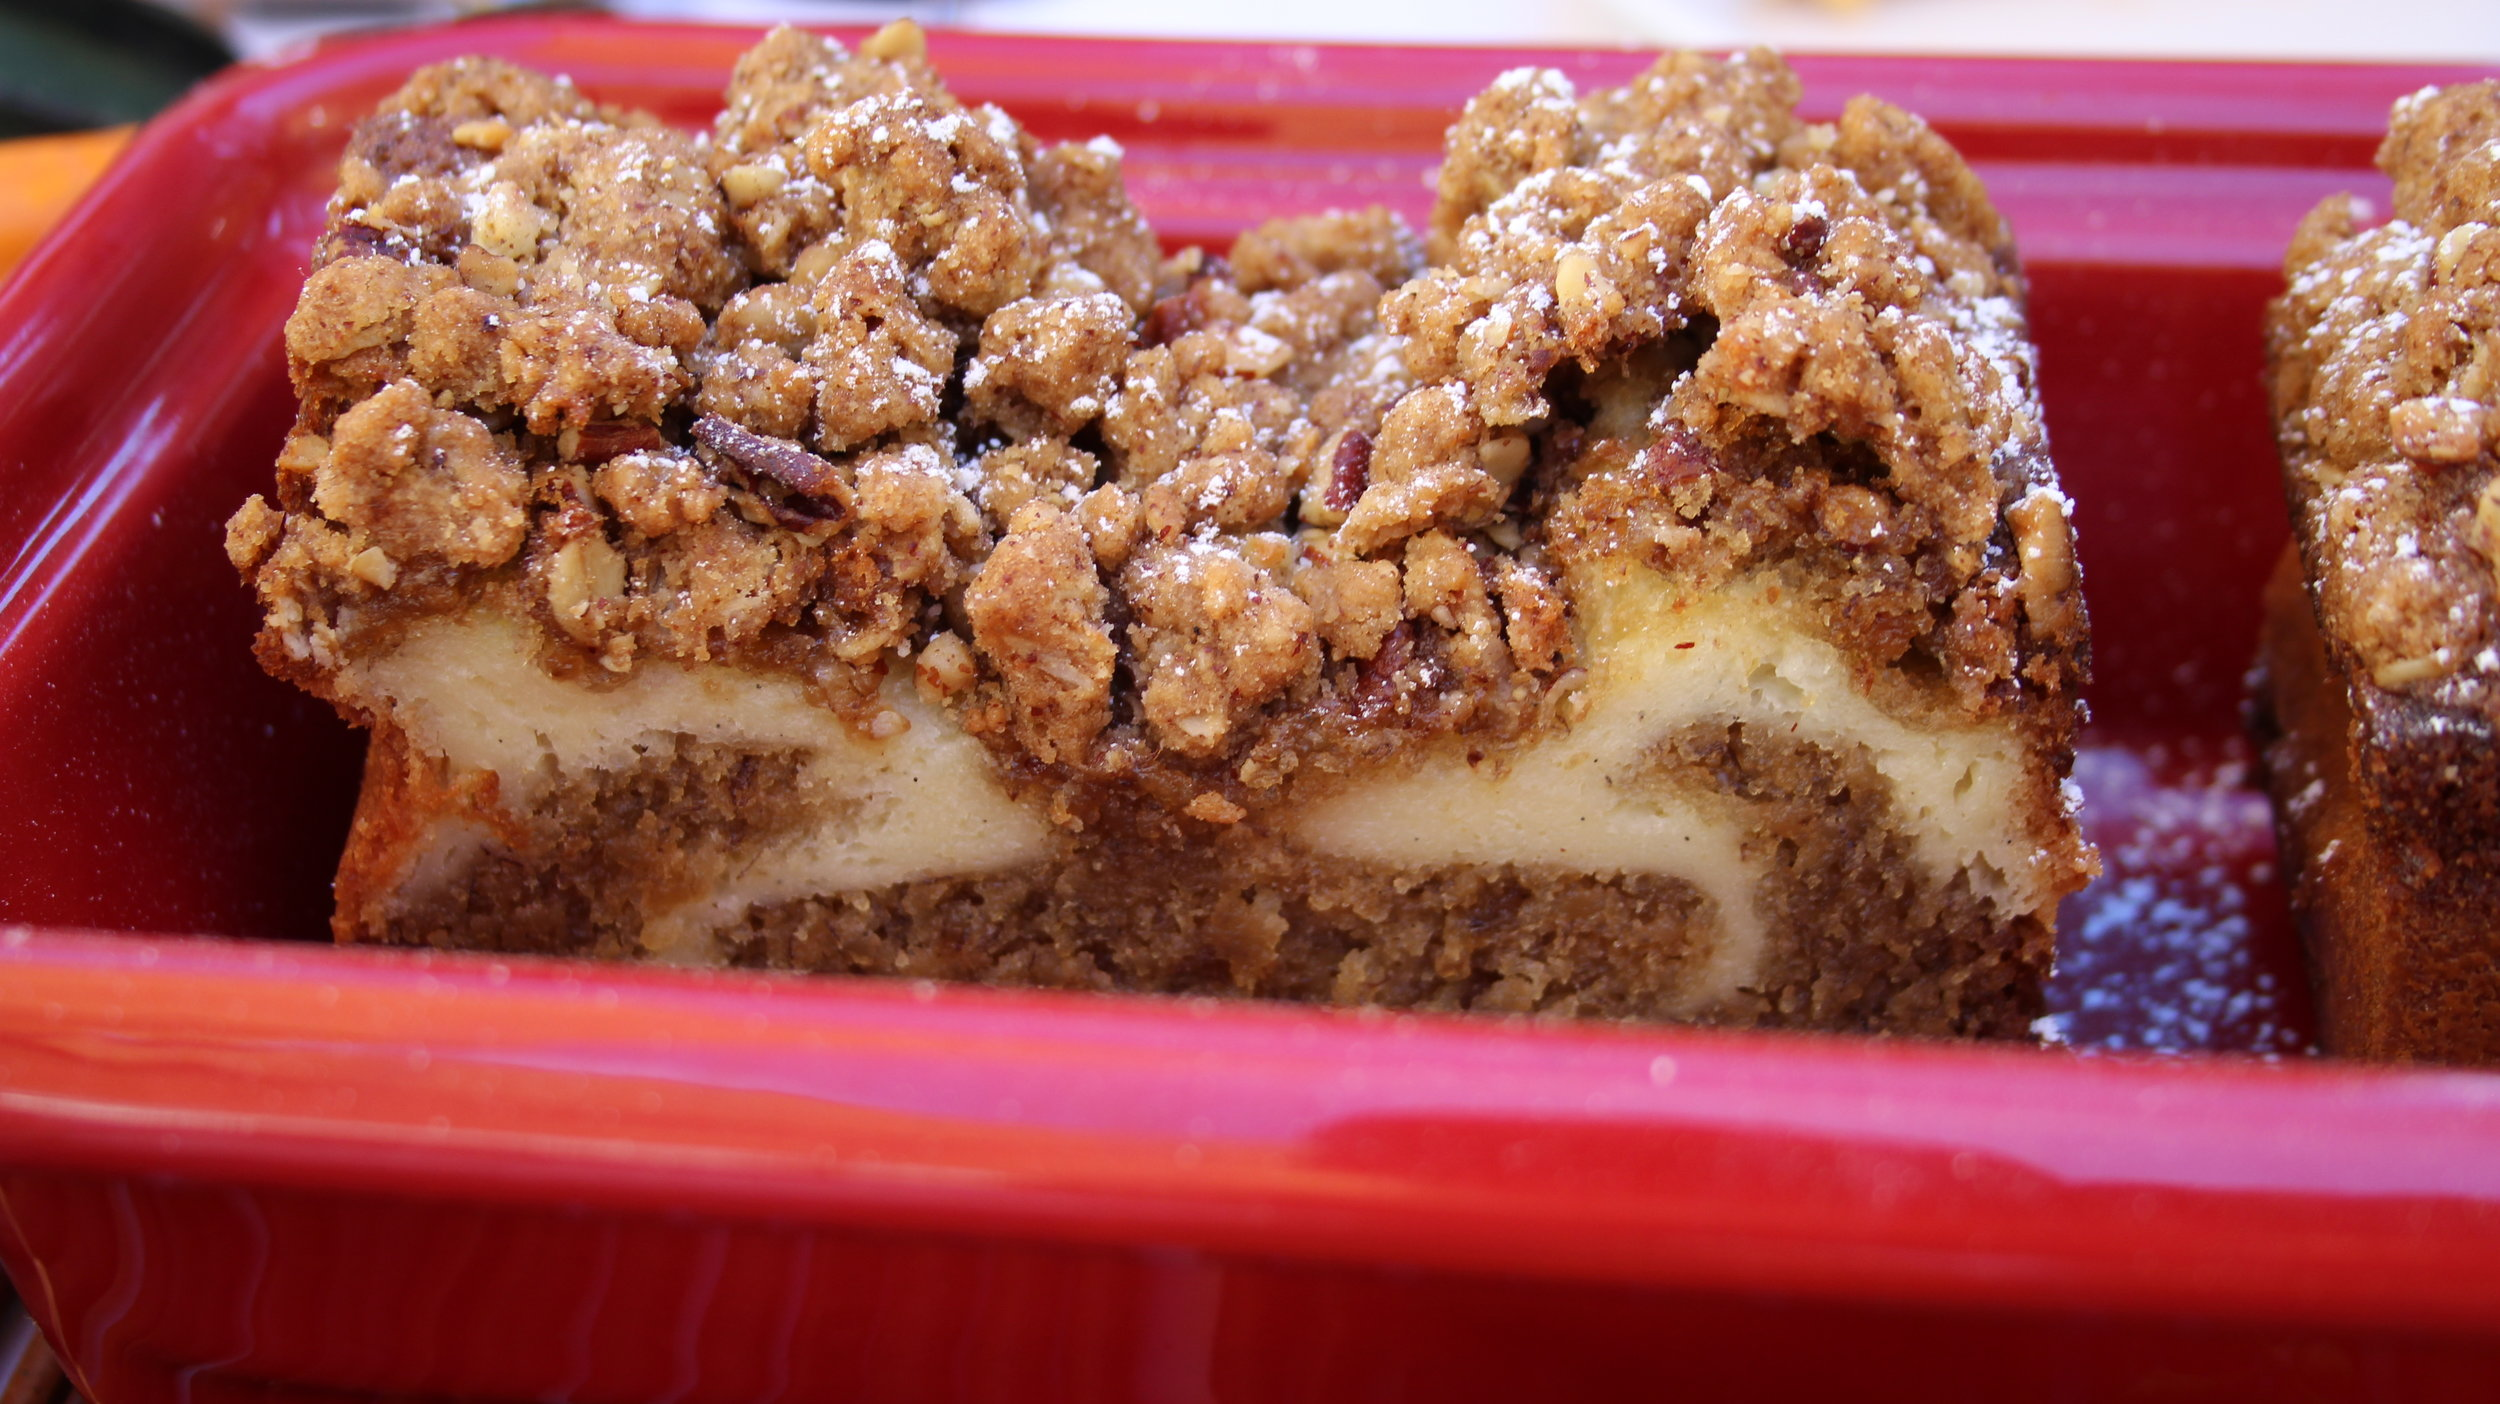 Spiced Banana Loaf with Cream Cheese Swirl & Pecan Oatmeal Crumble